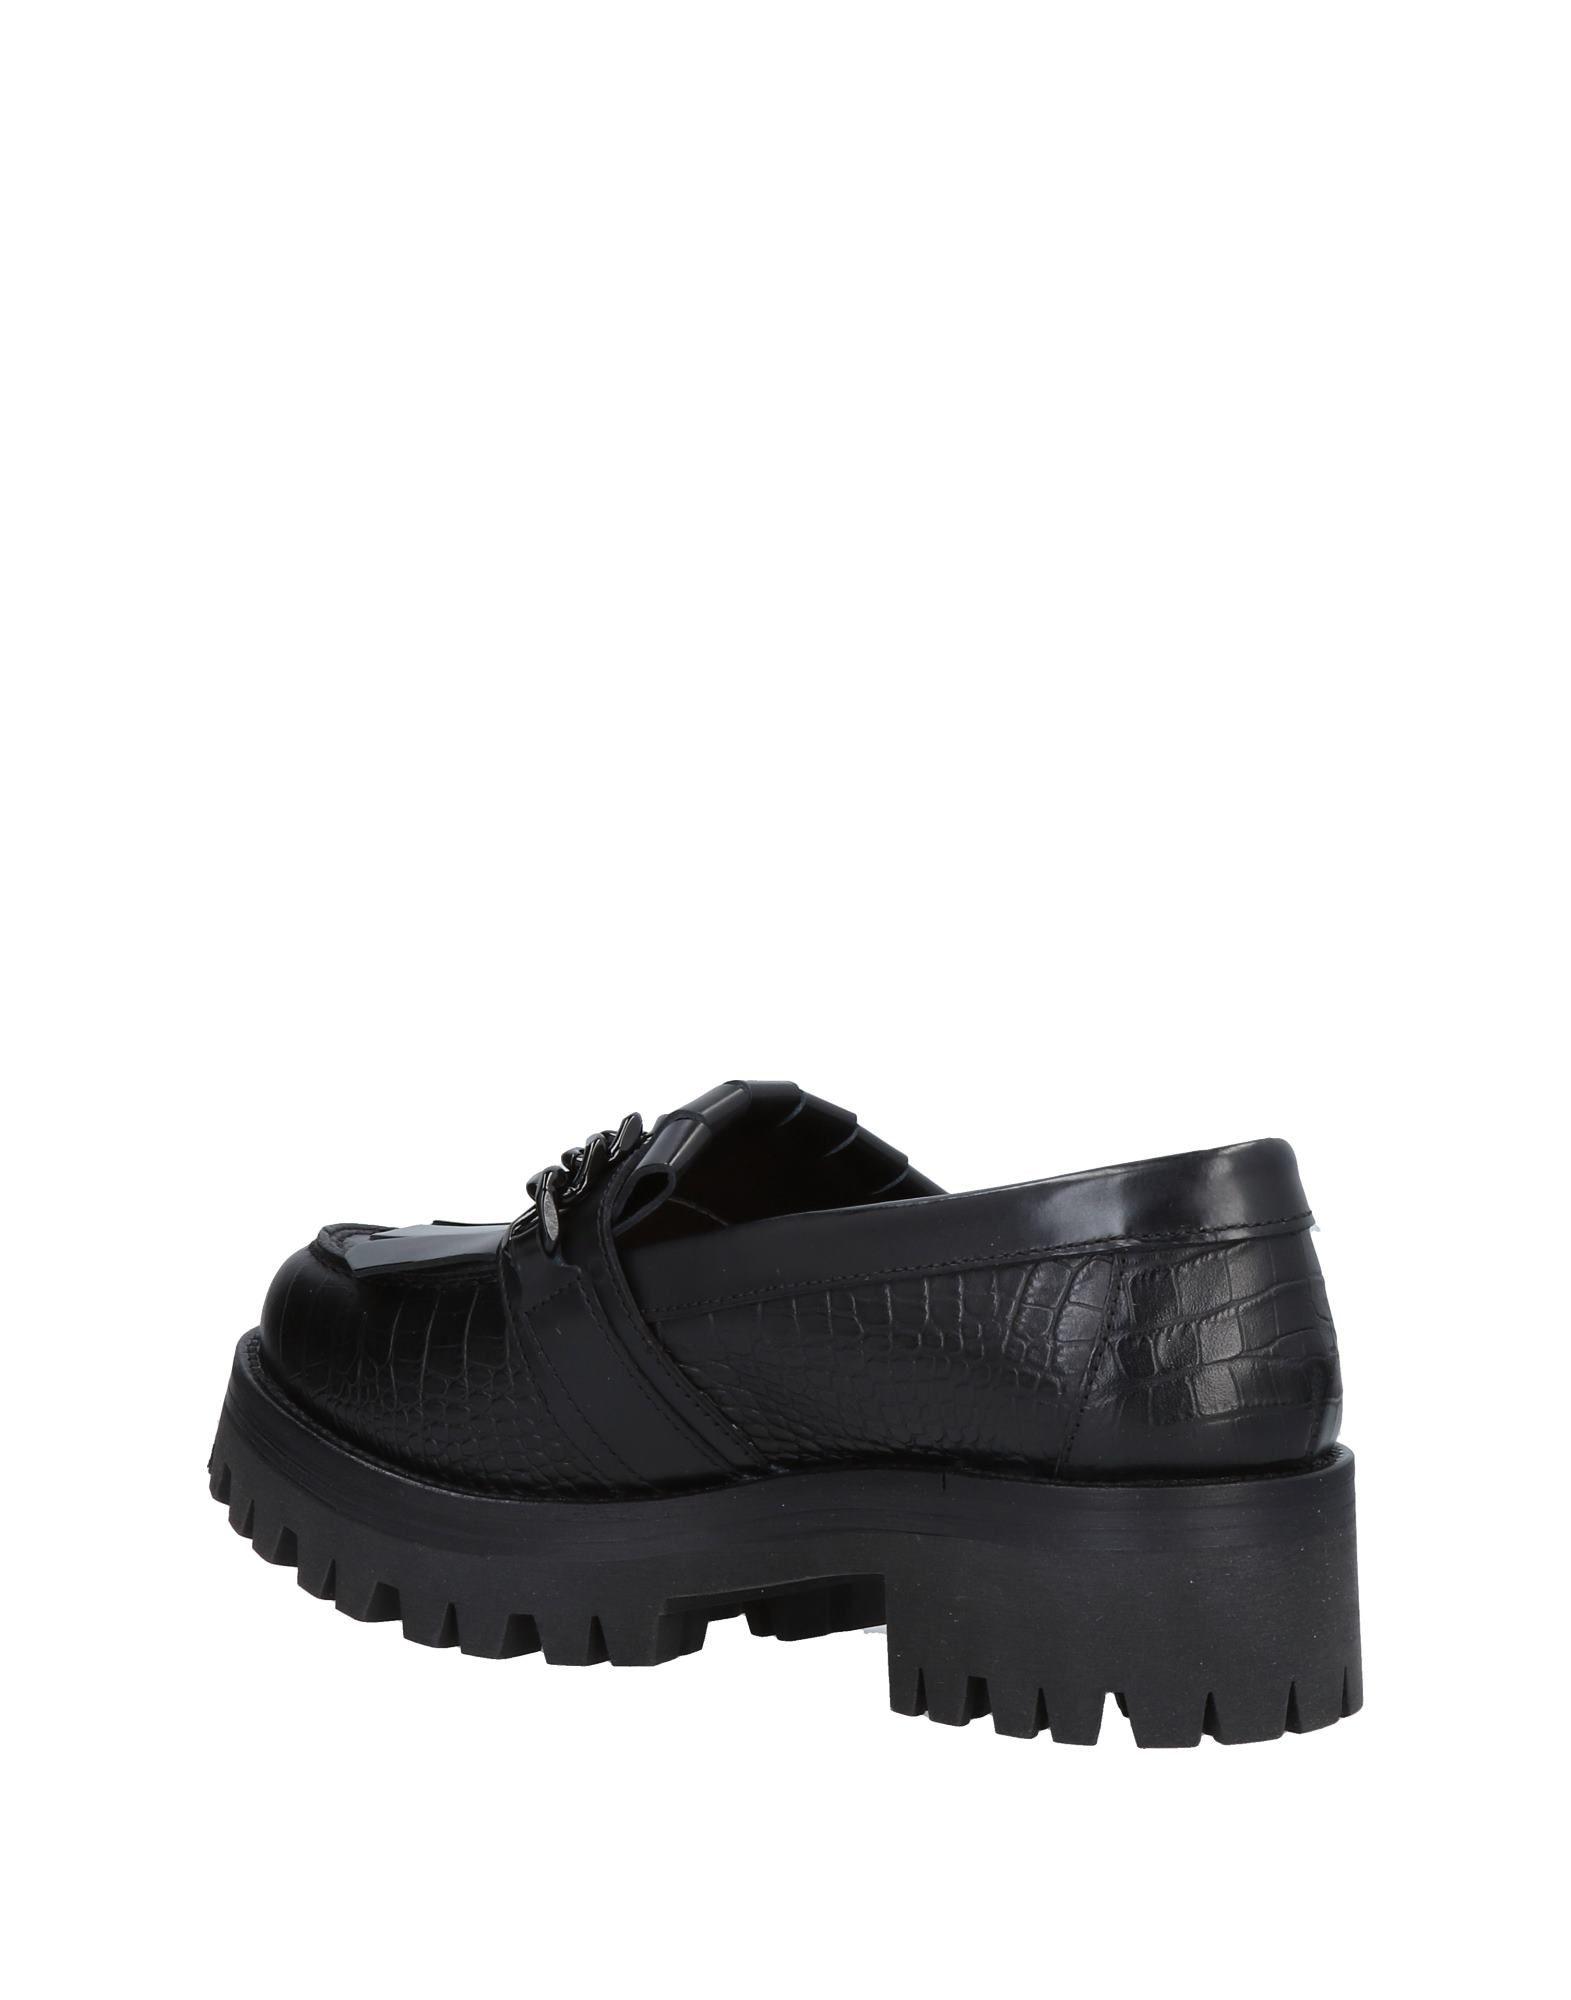 Cult Mokassins Damen  11473320EP 11473320EP  Gute Qualität beliebte Schuhe 8799ae